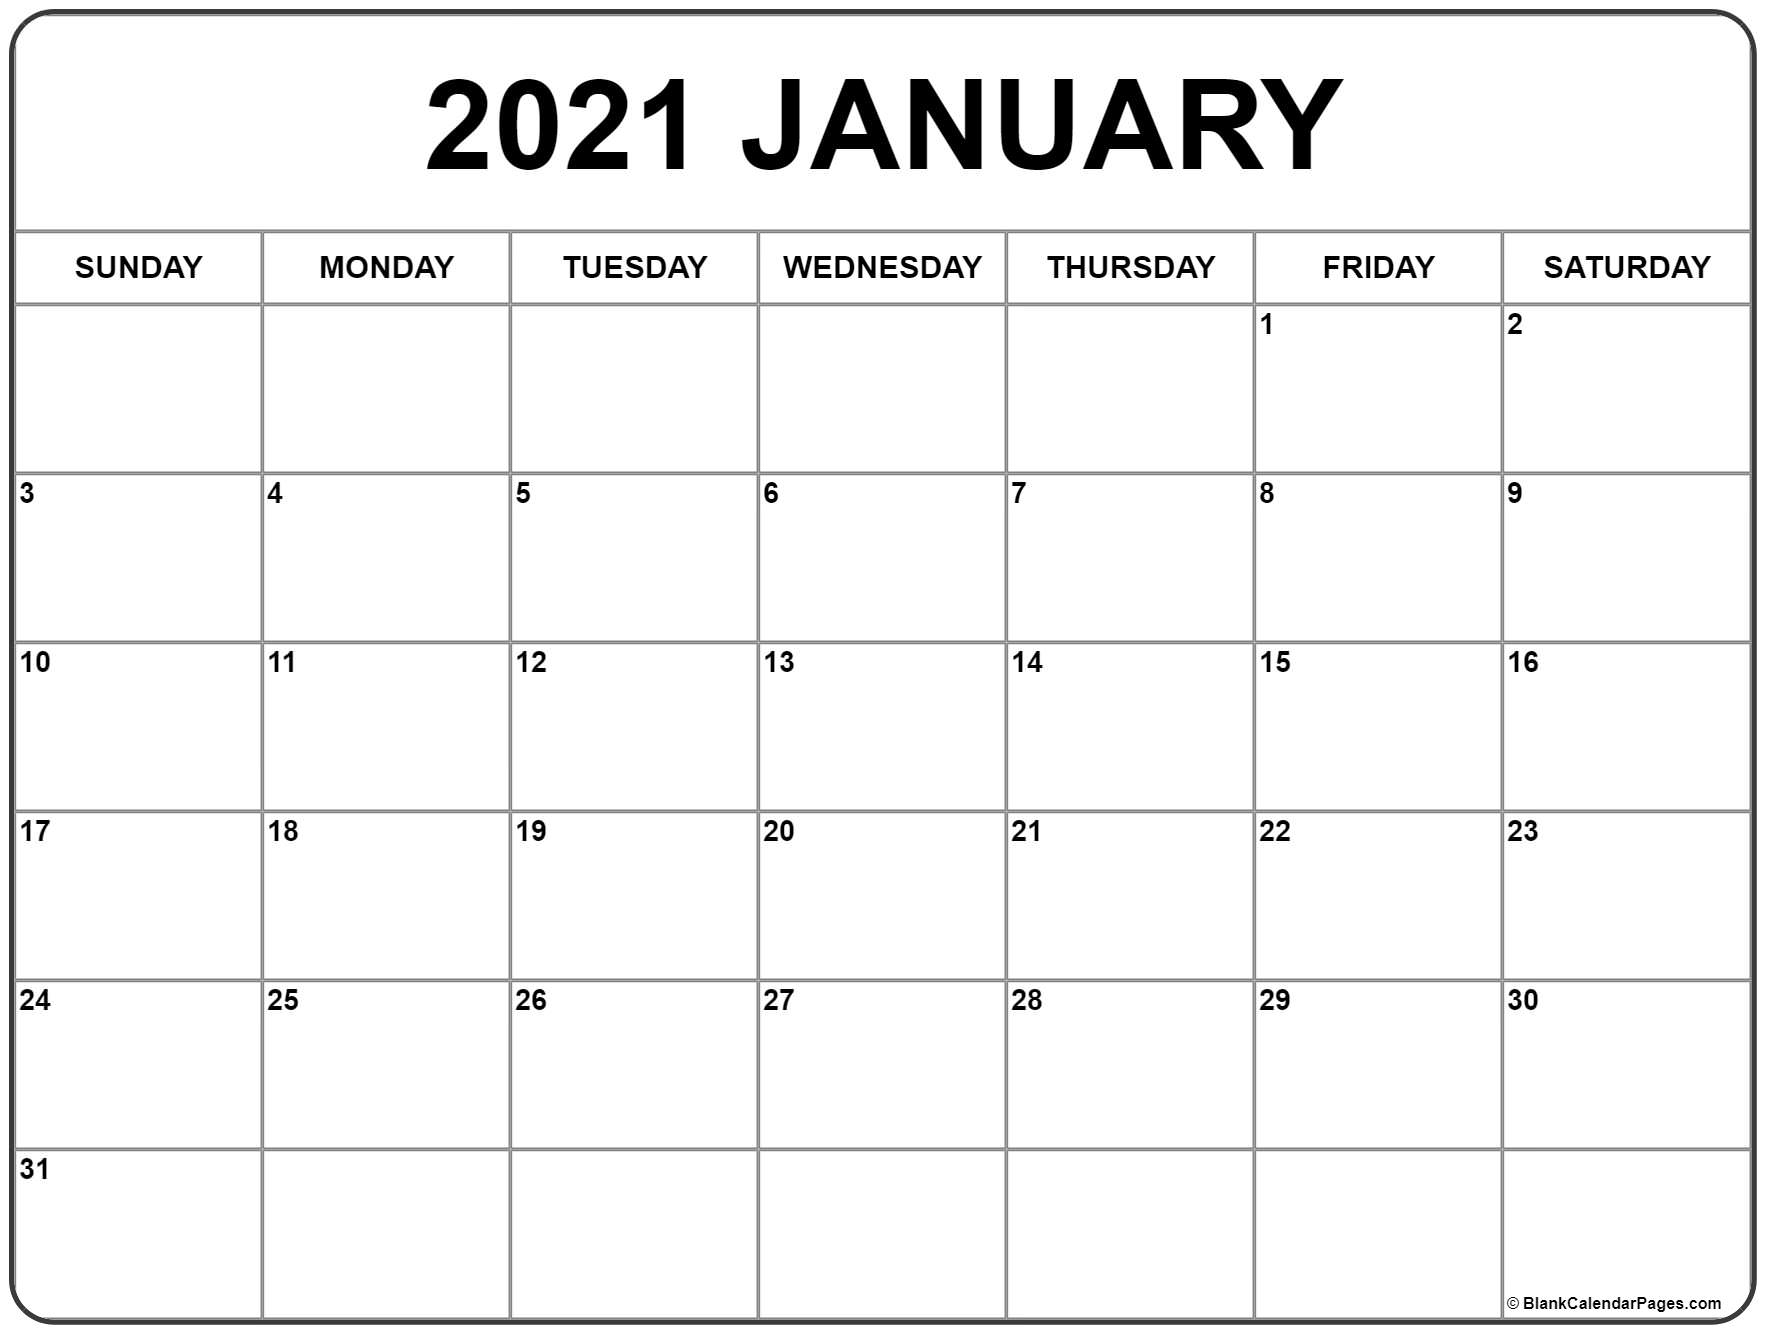 2021 Blank Calendar January   Free Printable Calendar